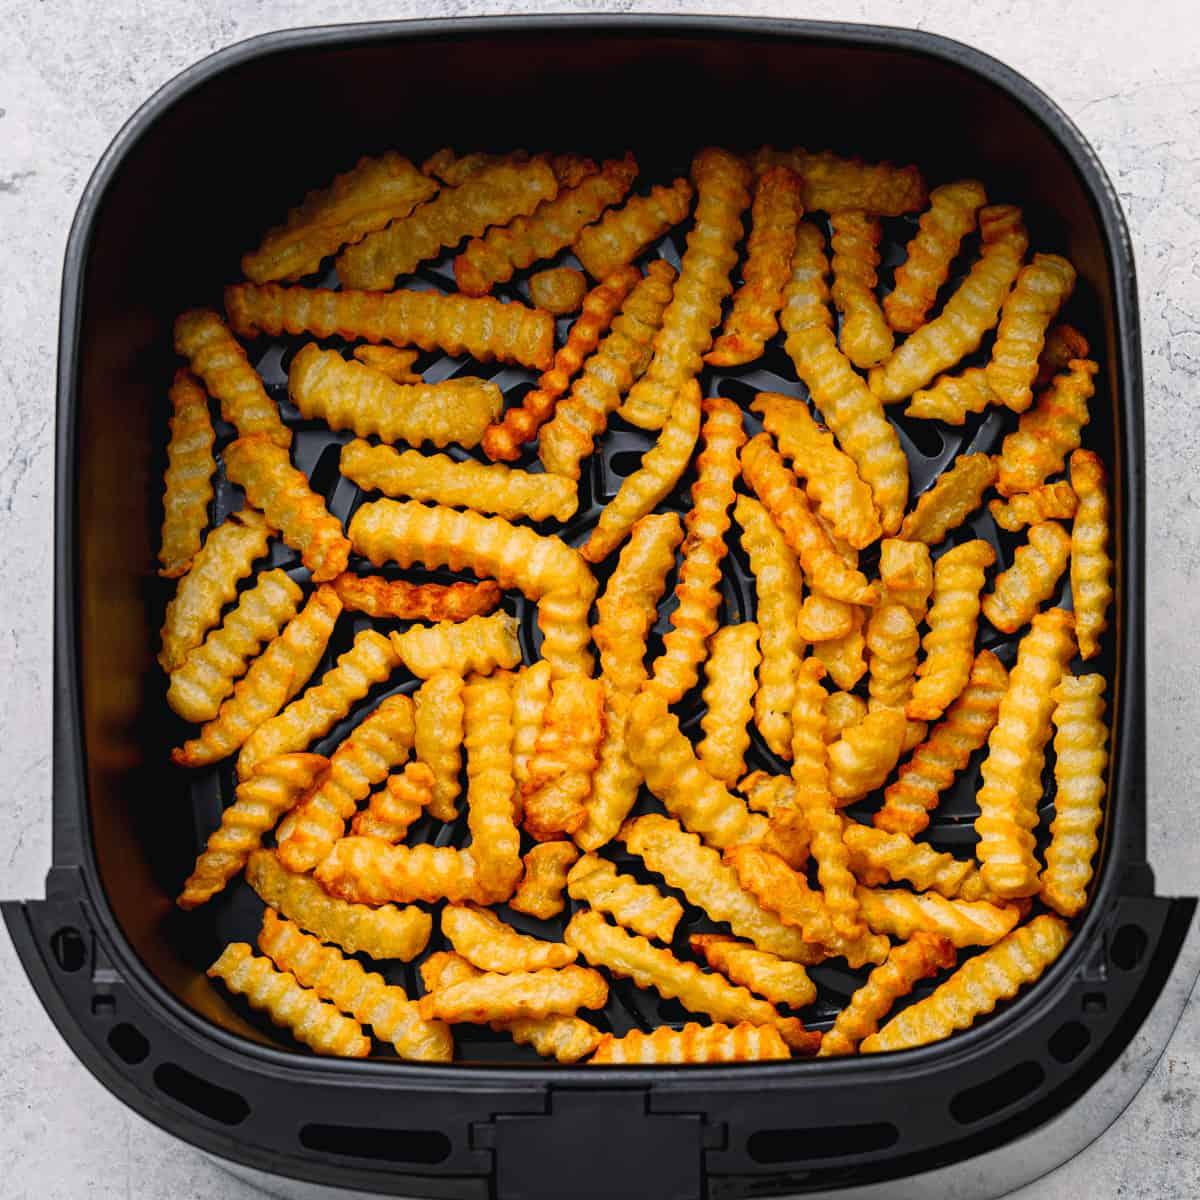 Crispy Air Fryer Frozen French Fries